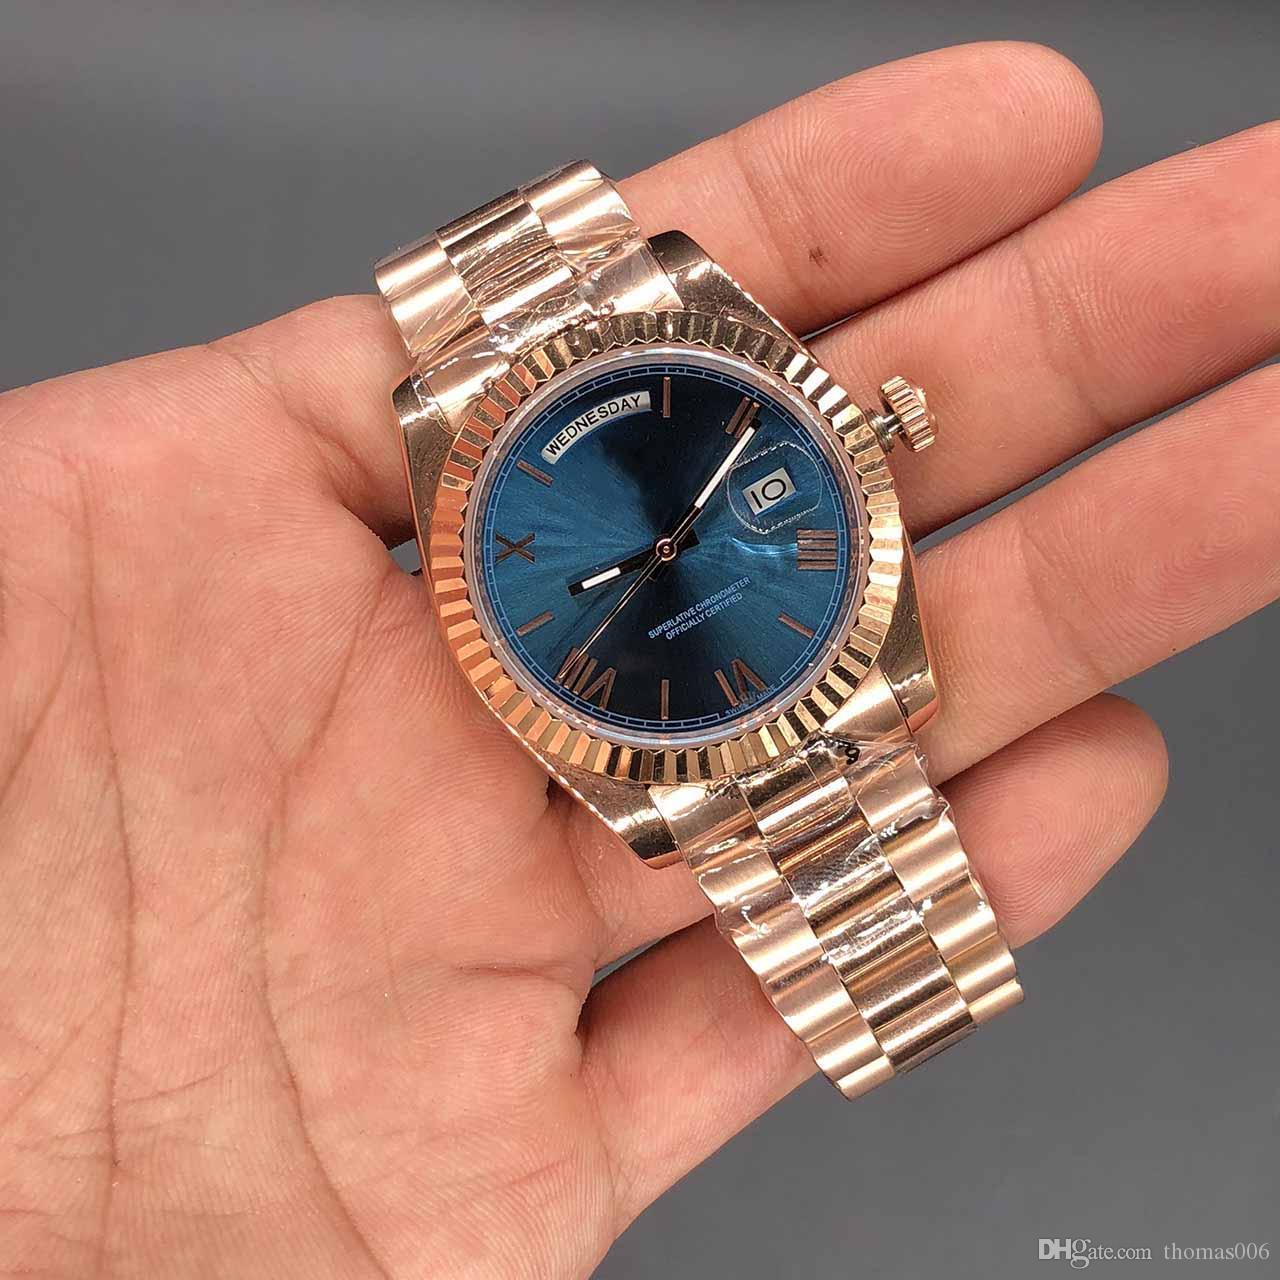 Dia / Data Blue Watch Dial Inoxidável Rose Gold WristWatch Preço Menor Mecânico Relógios Mecânicos Mens Automático 36mm Top LQFTL